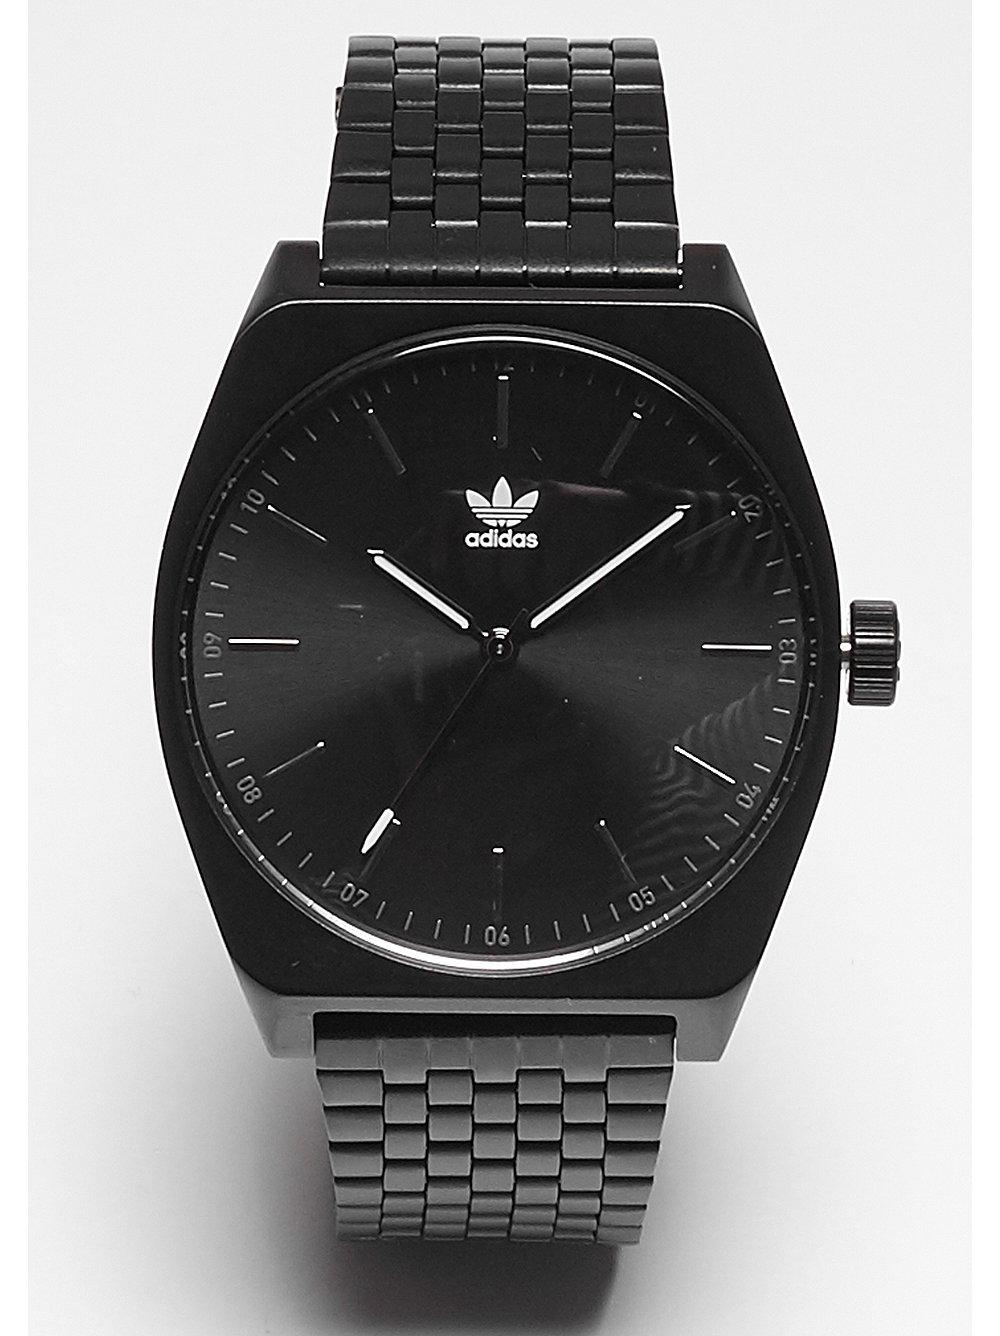 adidas Process M1 all black